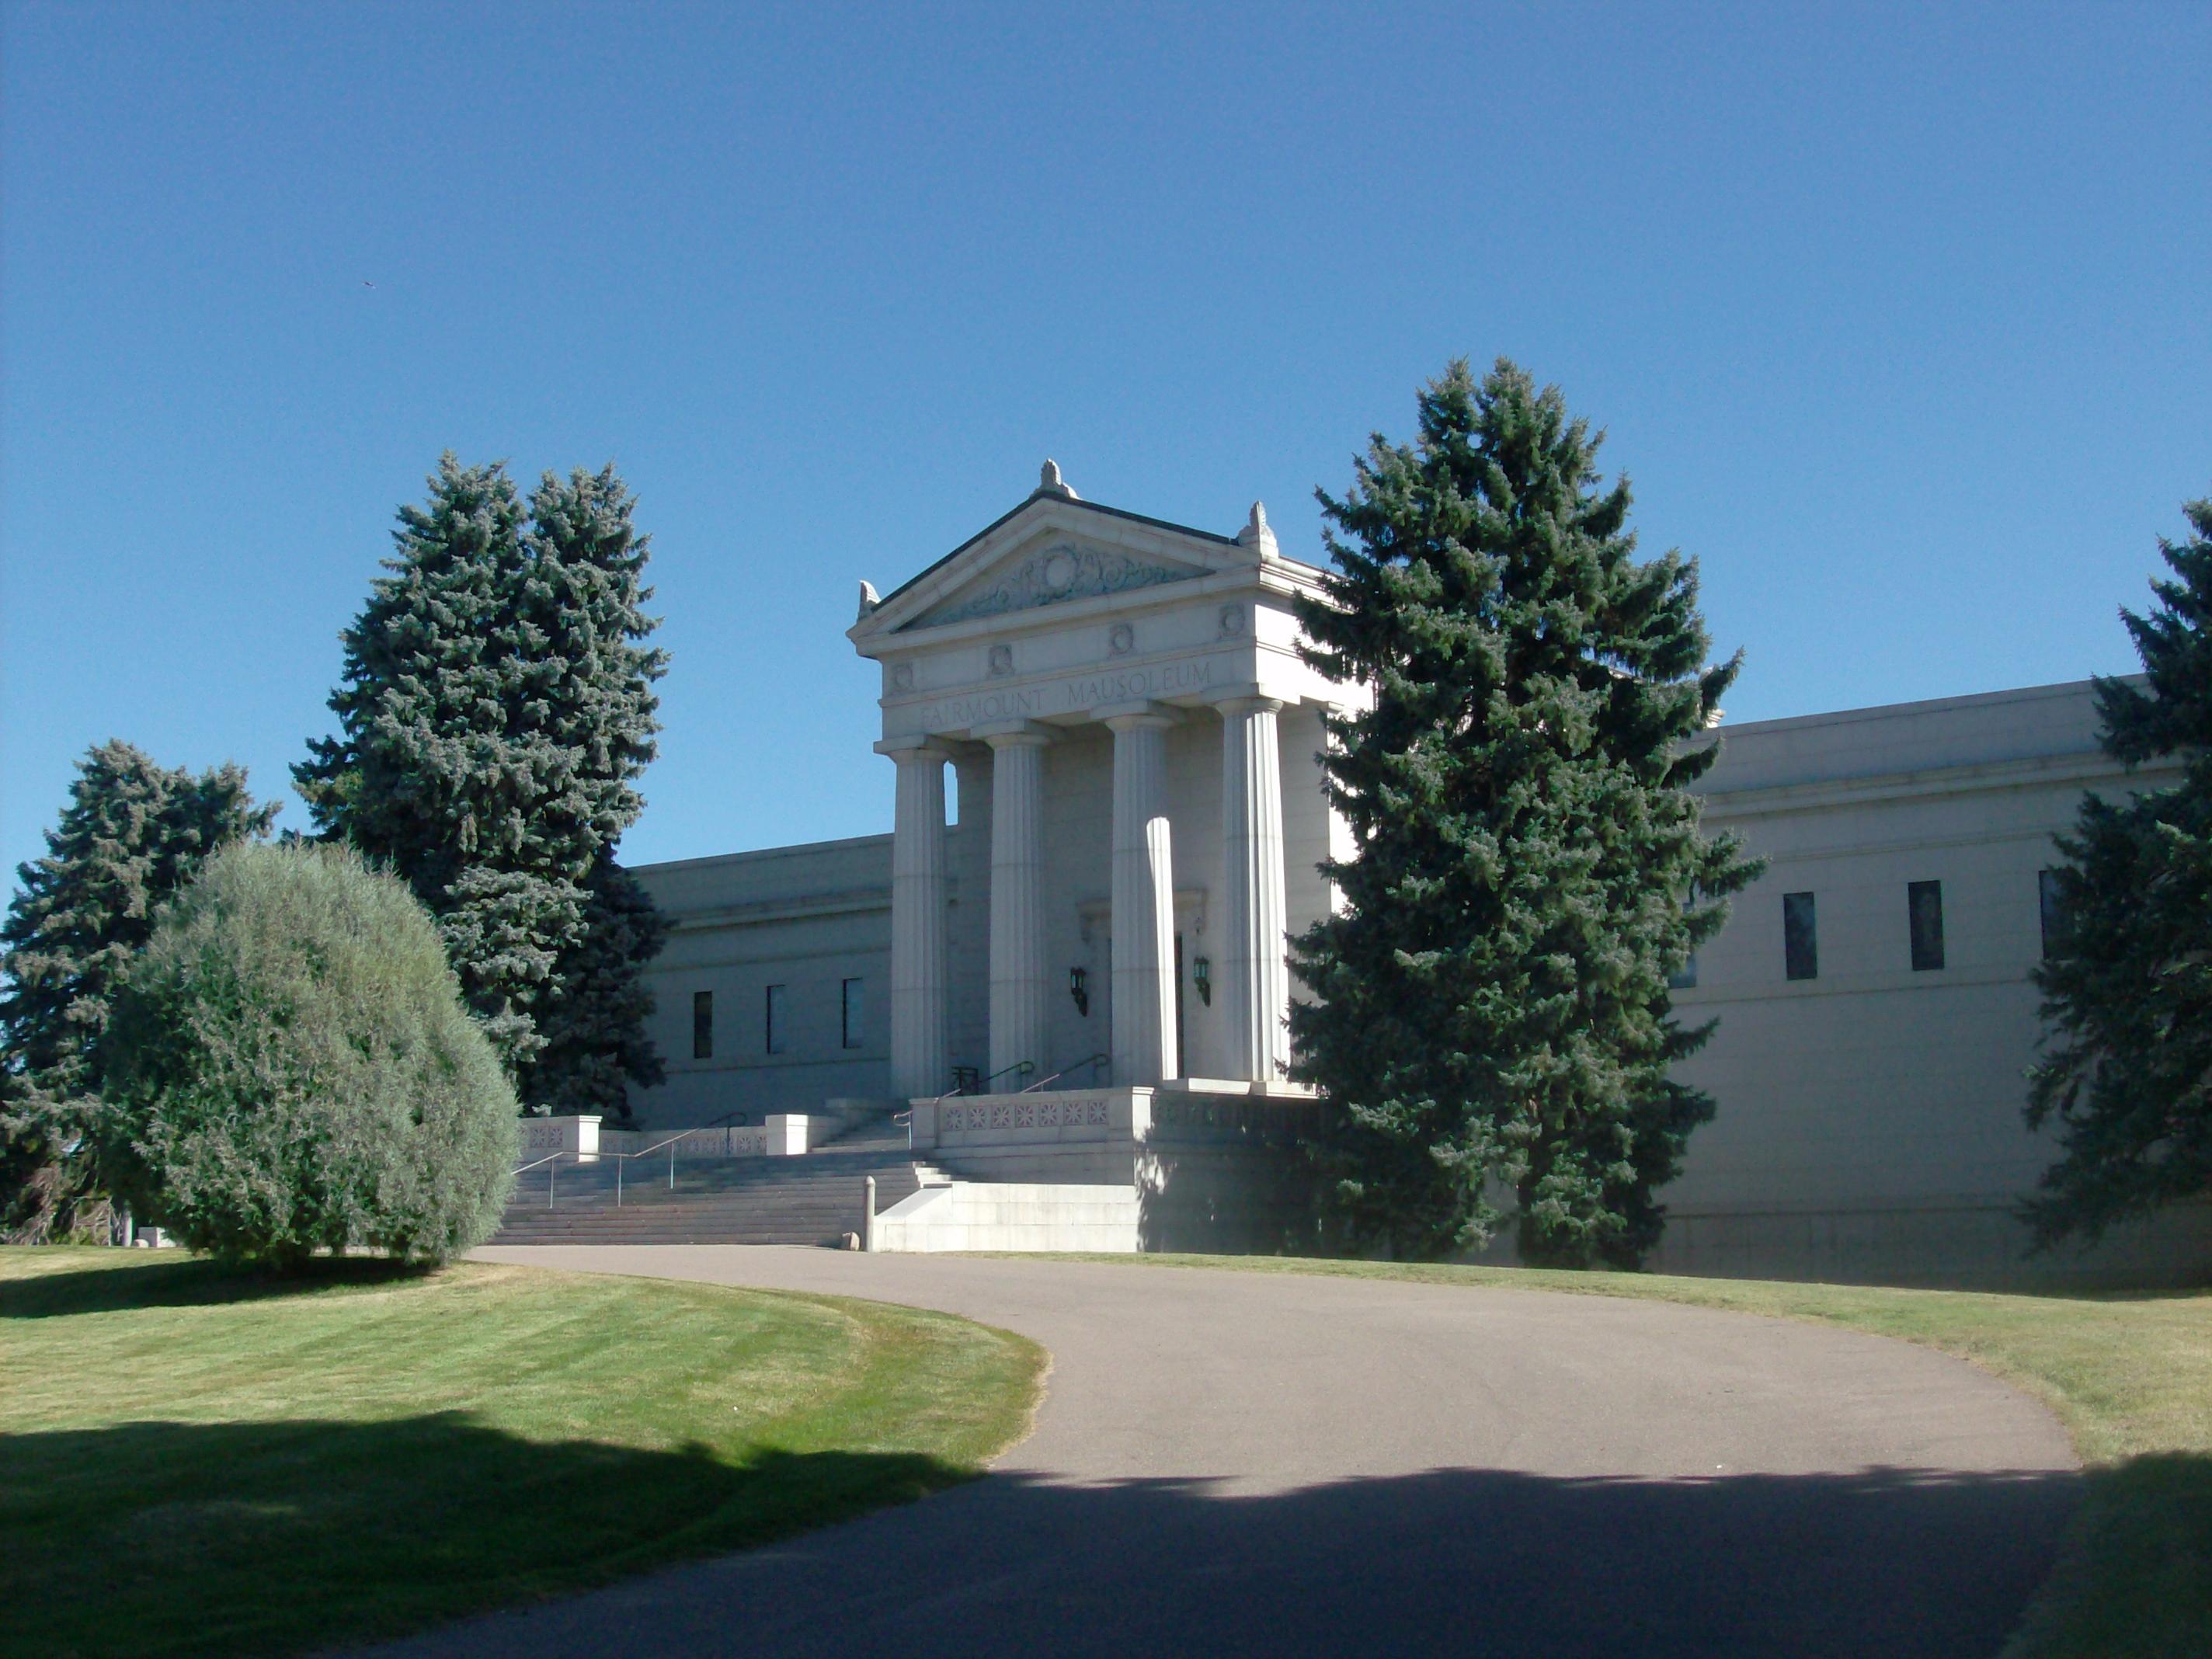 fairmount mausoleum denver colorado wikipedia